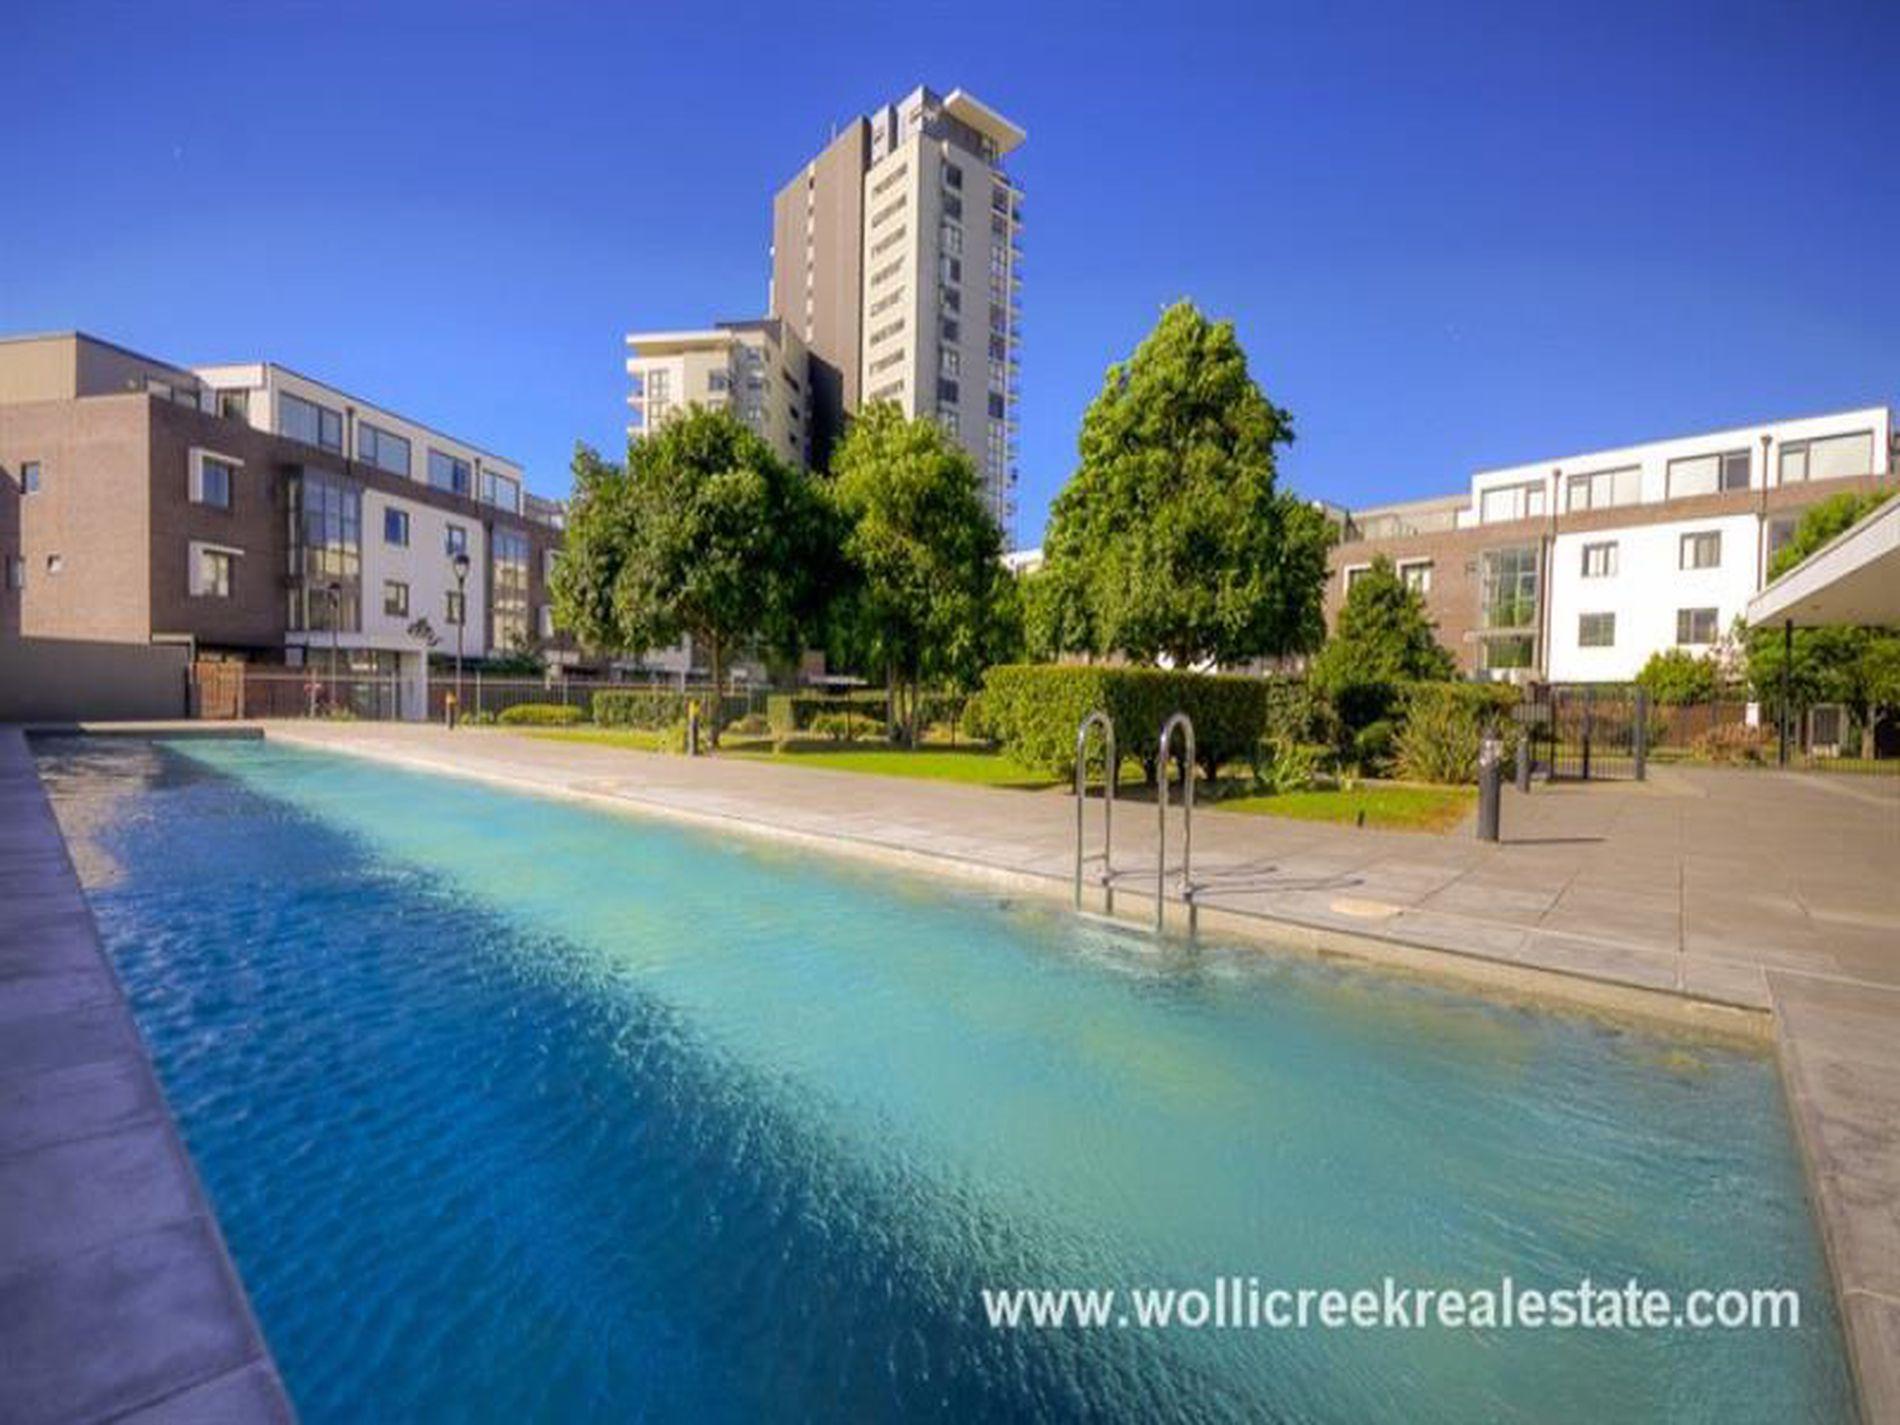 Wolli Creek